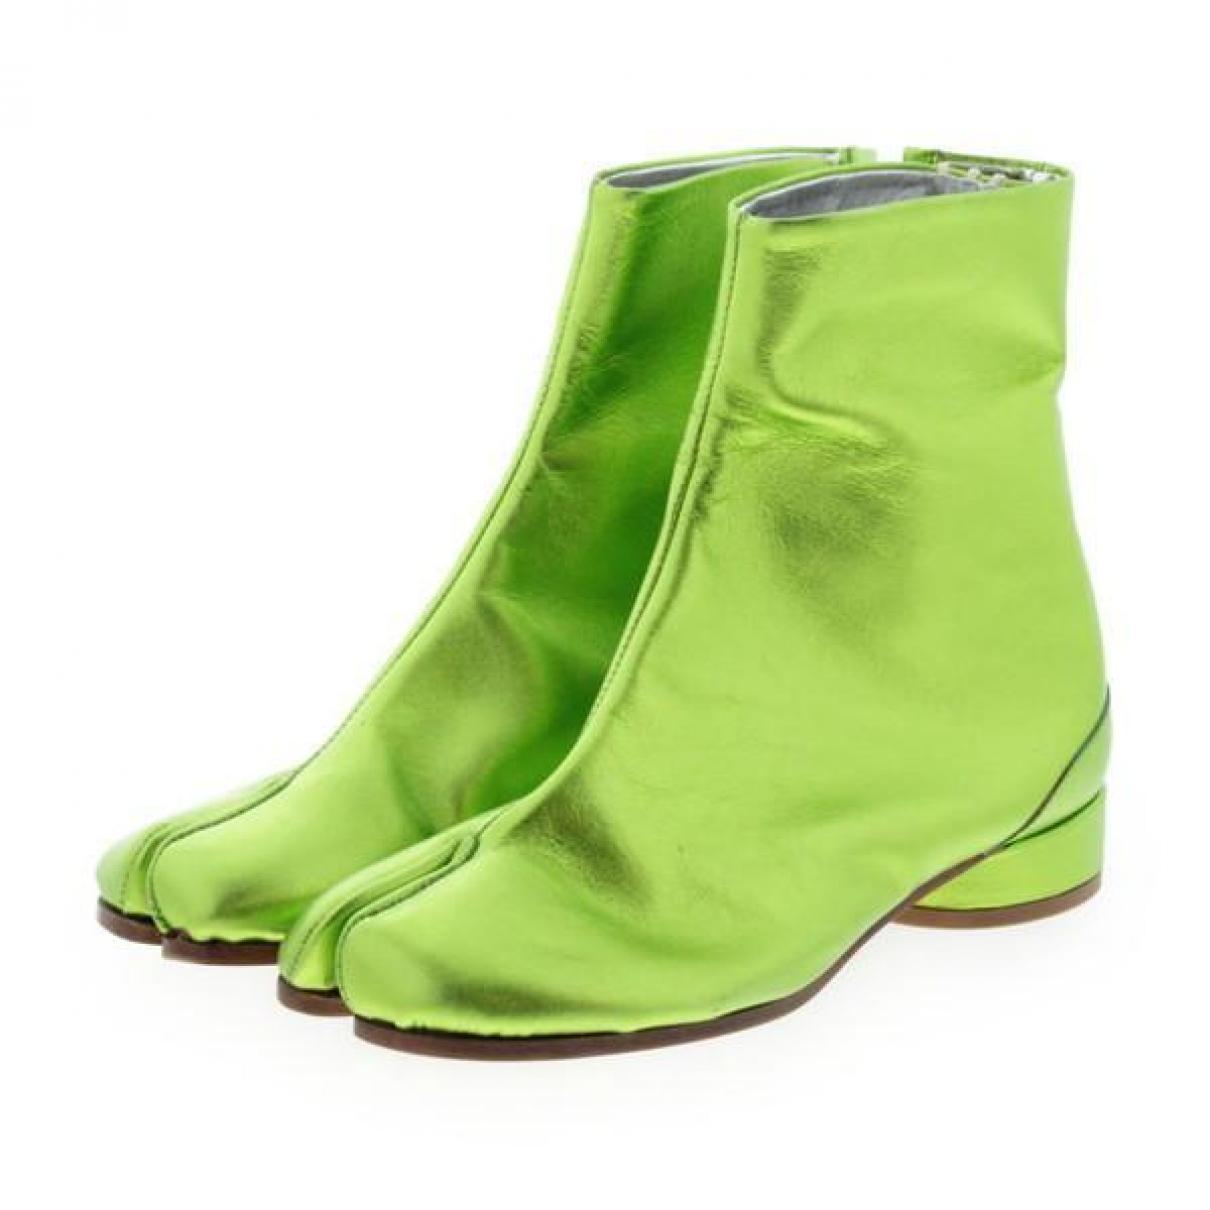 Maison Martin Margiela - Boots Tabi pour femme en cuir - vert